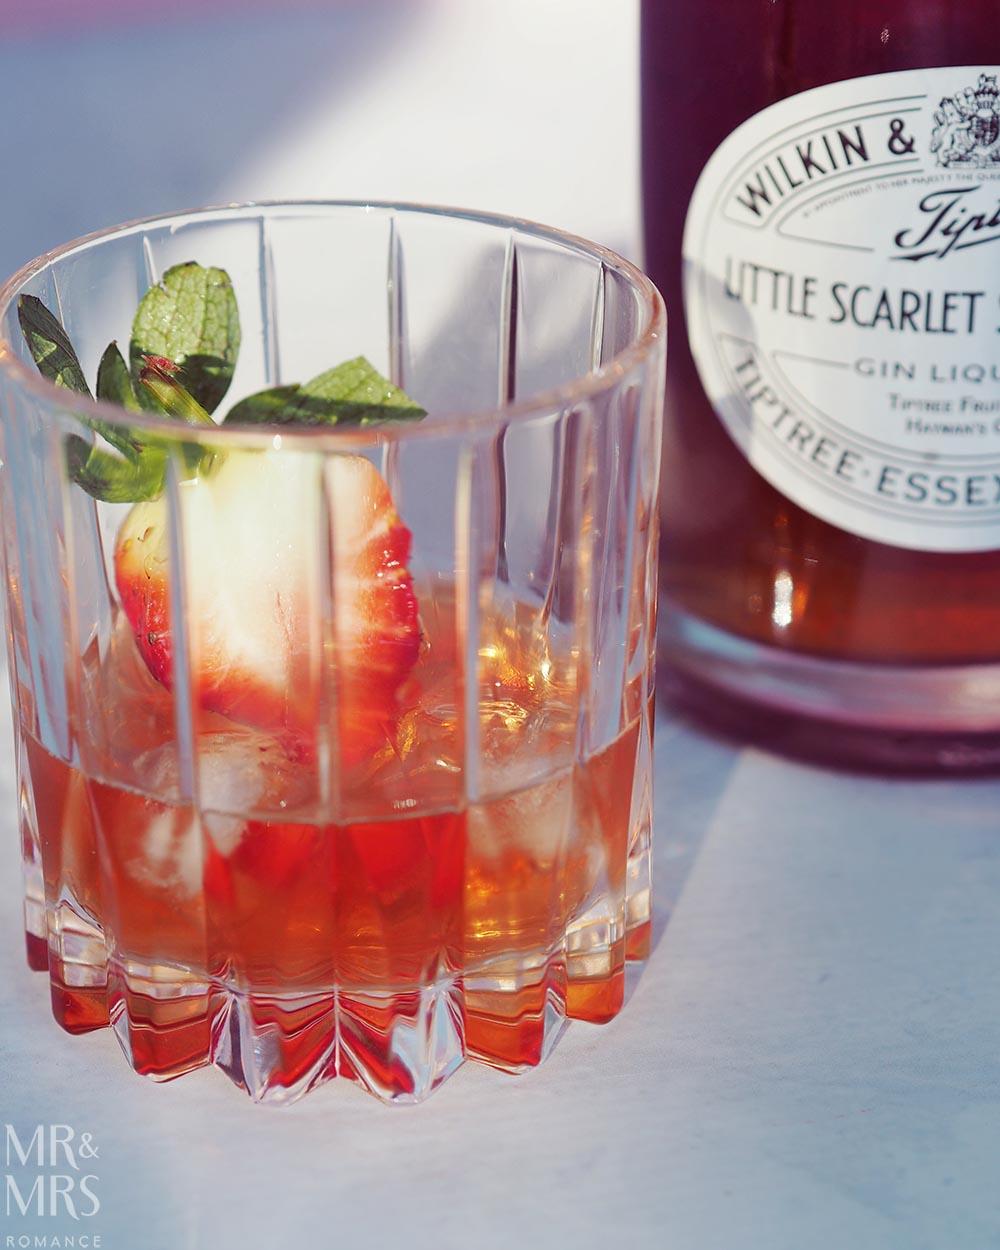 Wilkin Estates Tiptree Jam Co - Little Scarlet strawberry gin liqueur